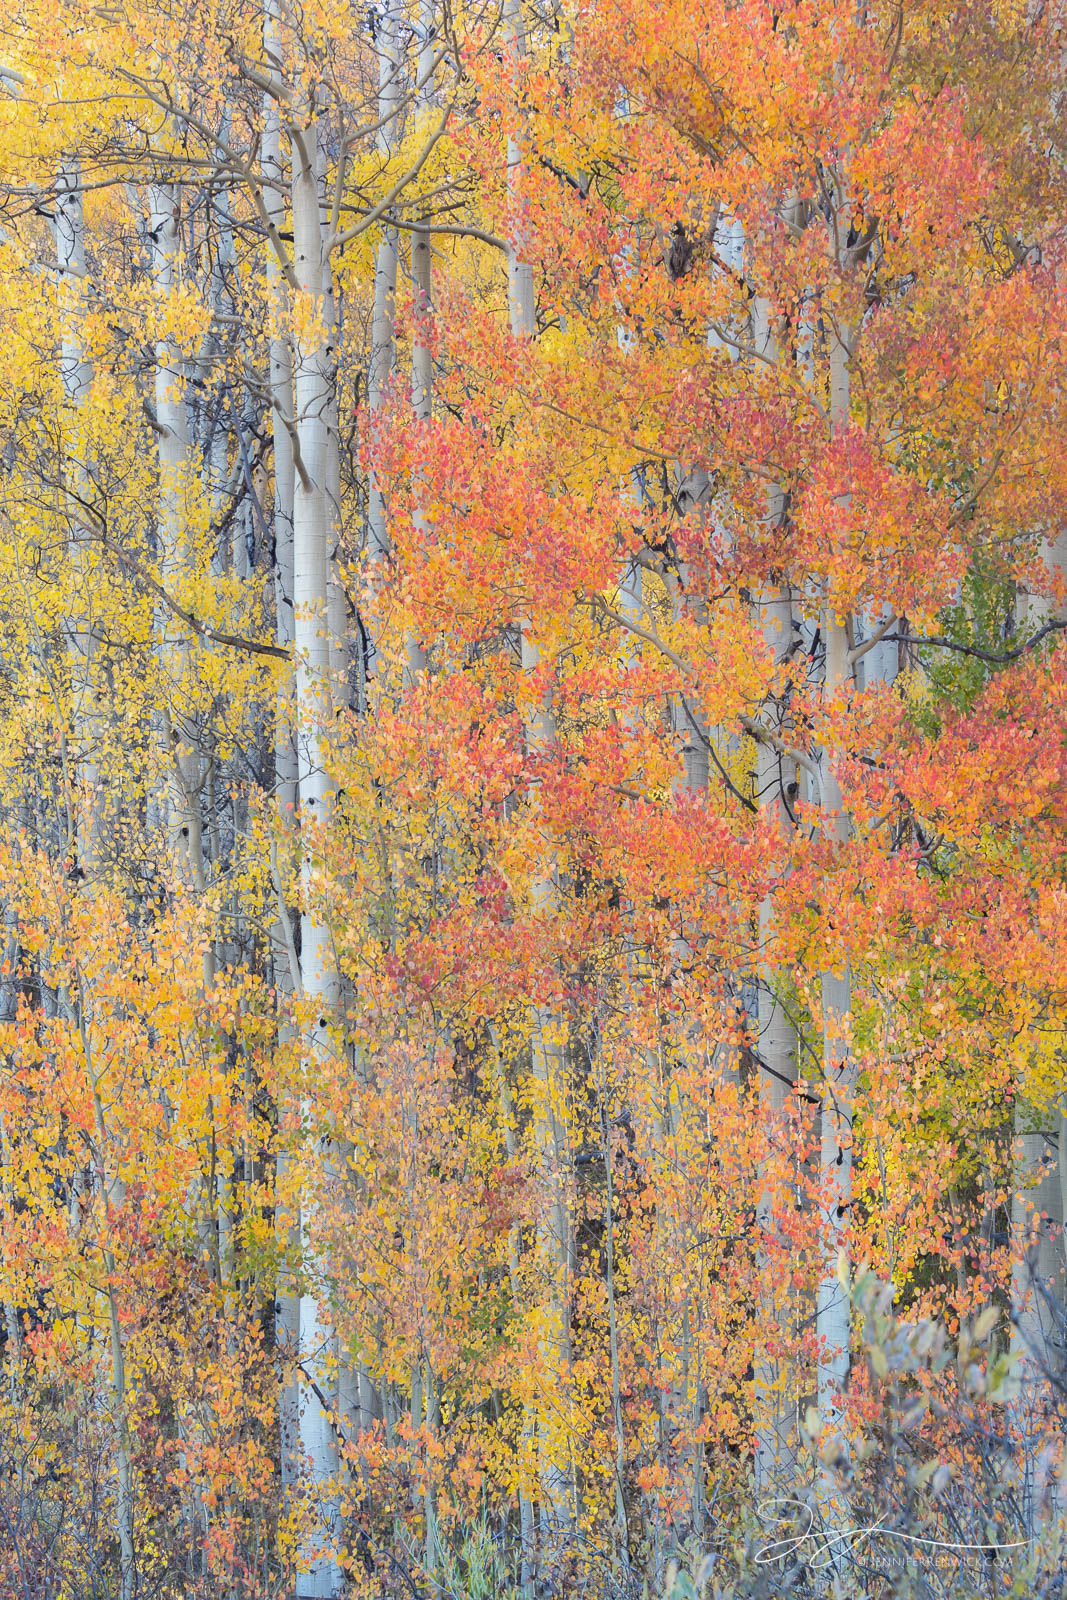 Colorado, Crested Butte, landscape, Elk Mountains, aspen, autumn, Kebler Pass, small scene, trees, forest, photo